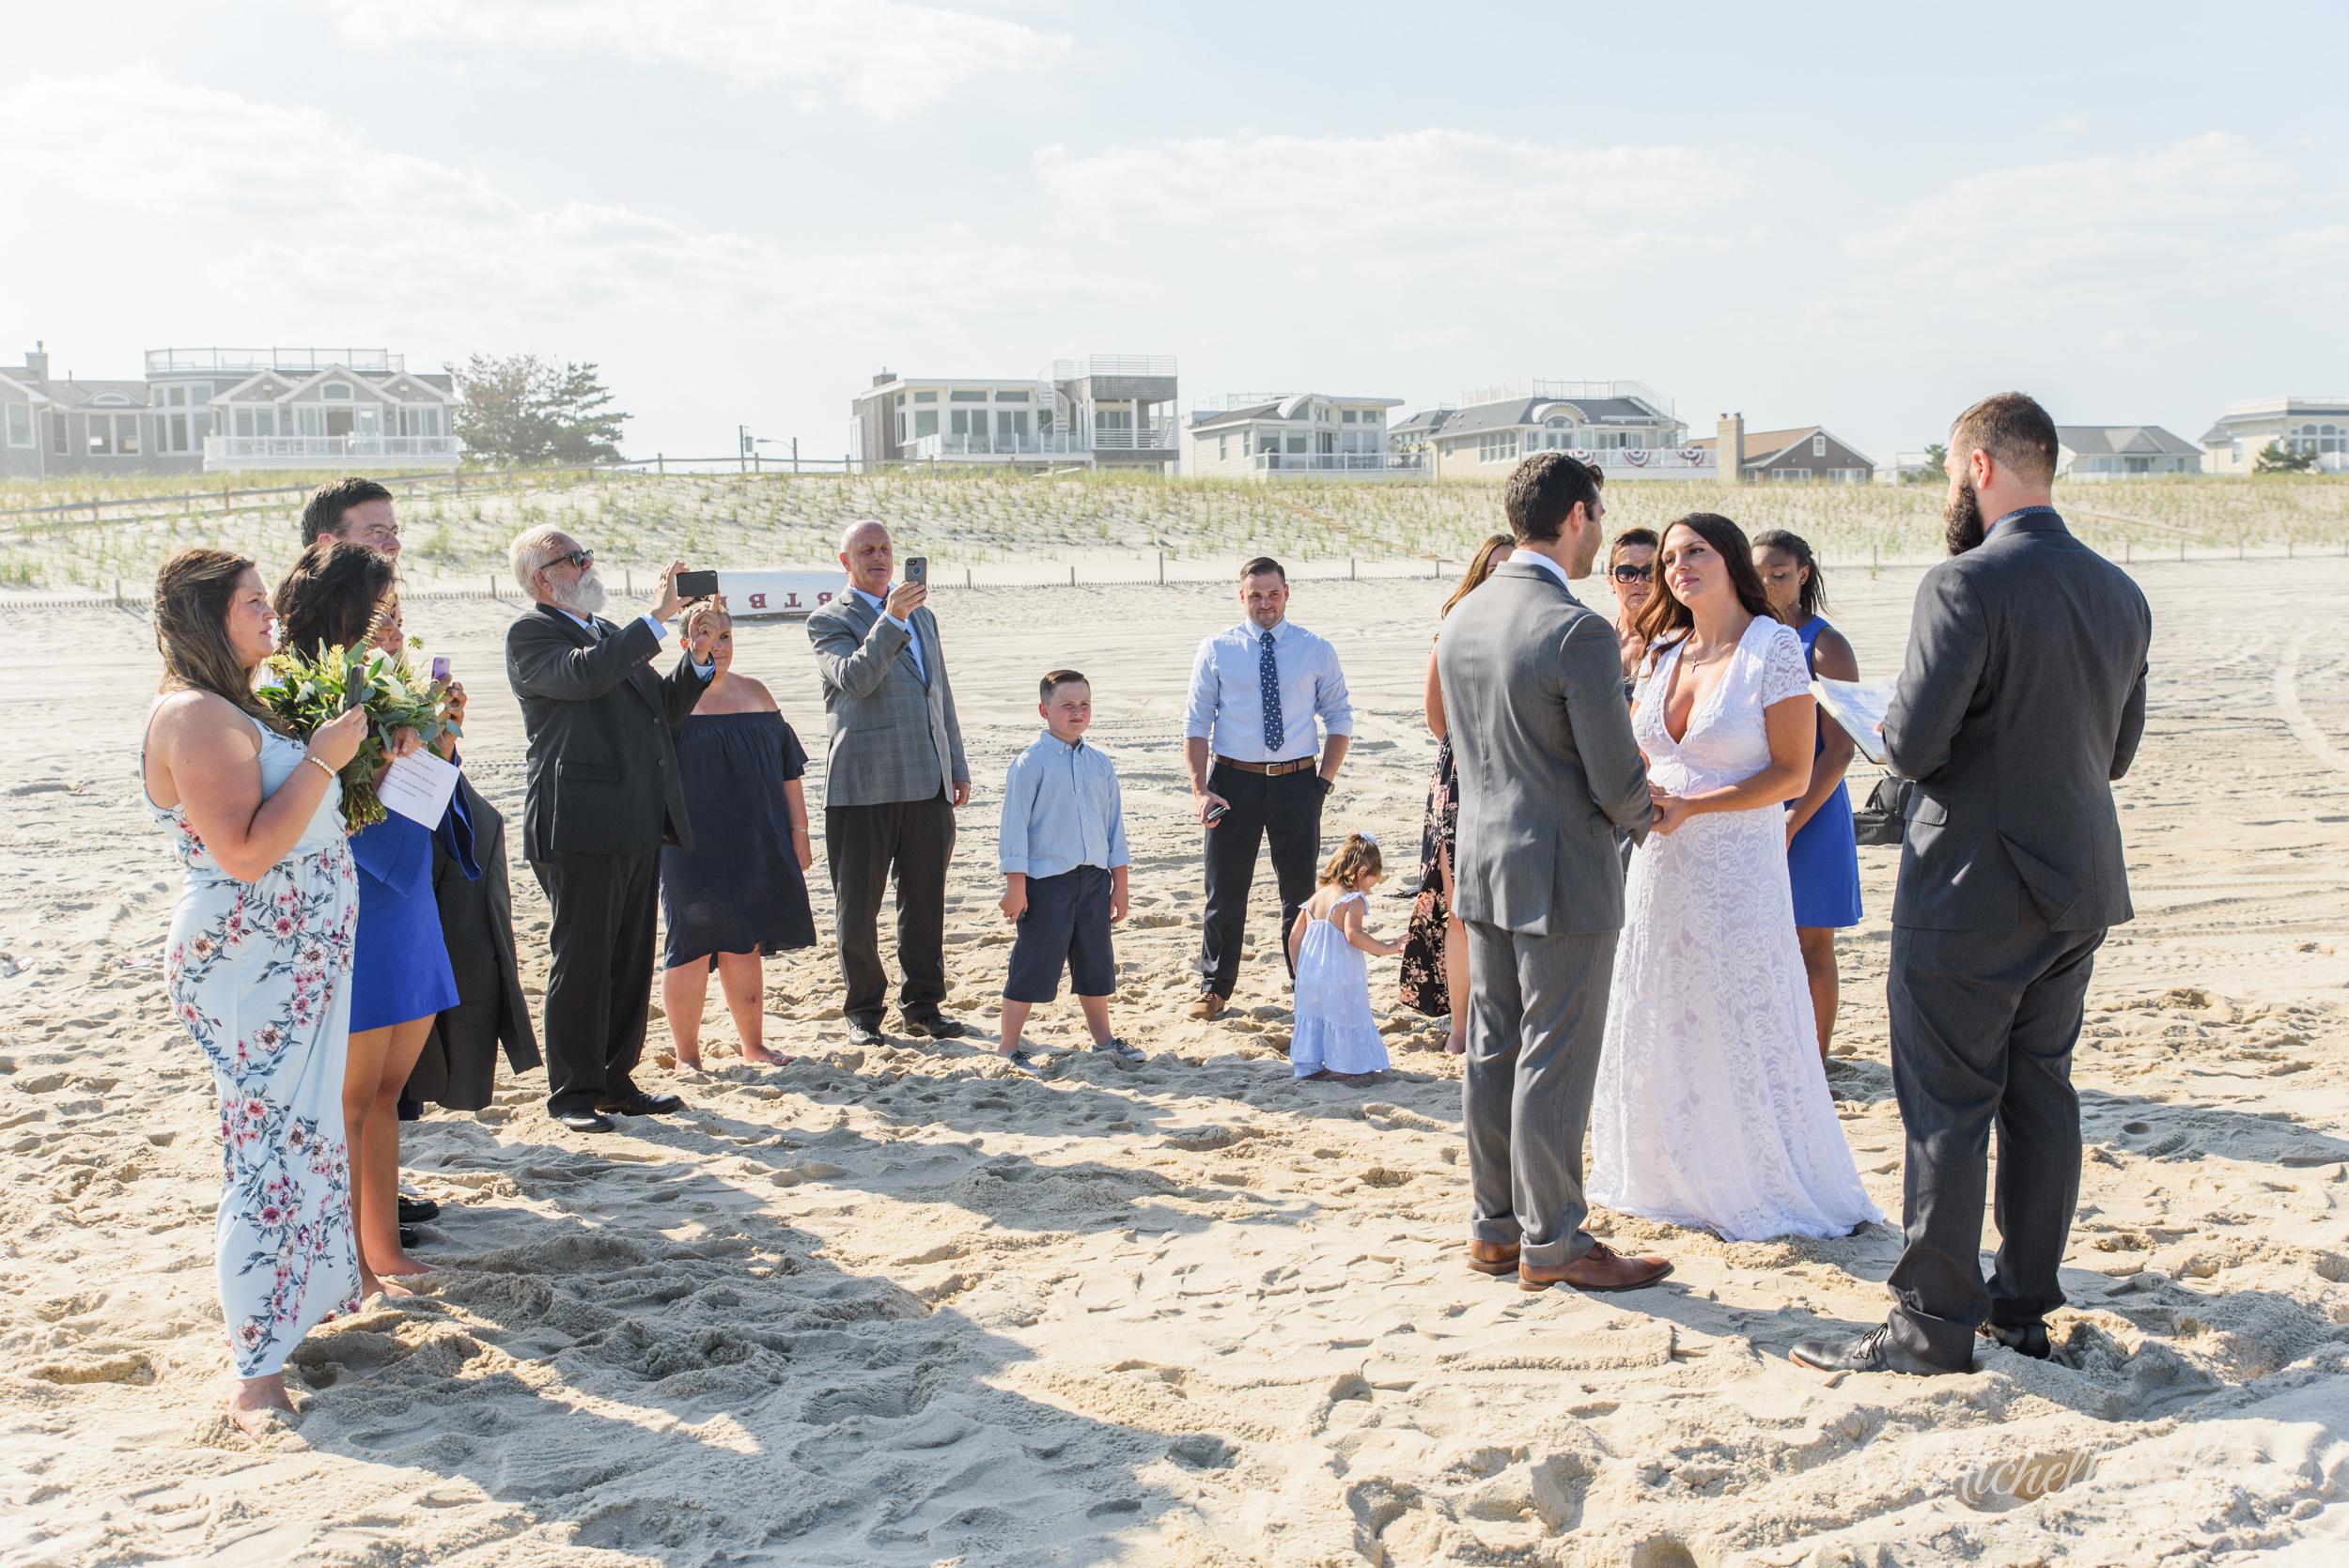 mlw-brant-beach-lbi-wedding-photography-21.jpg